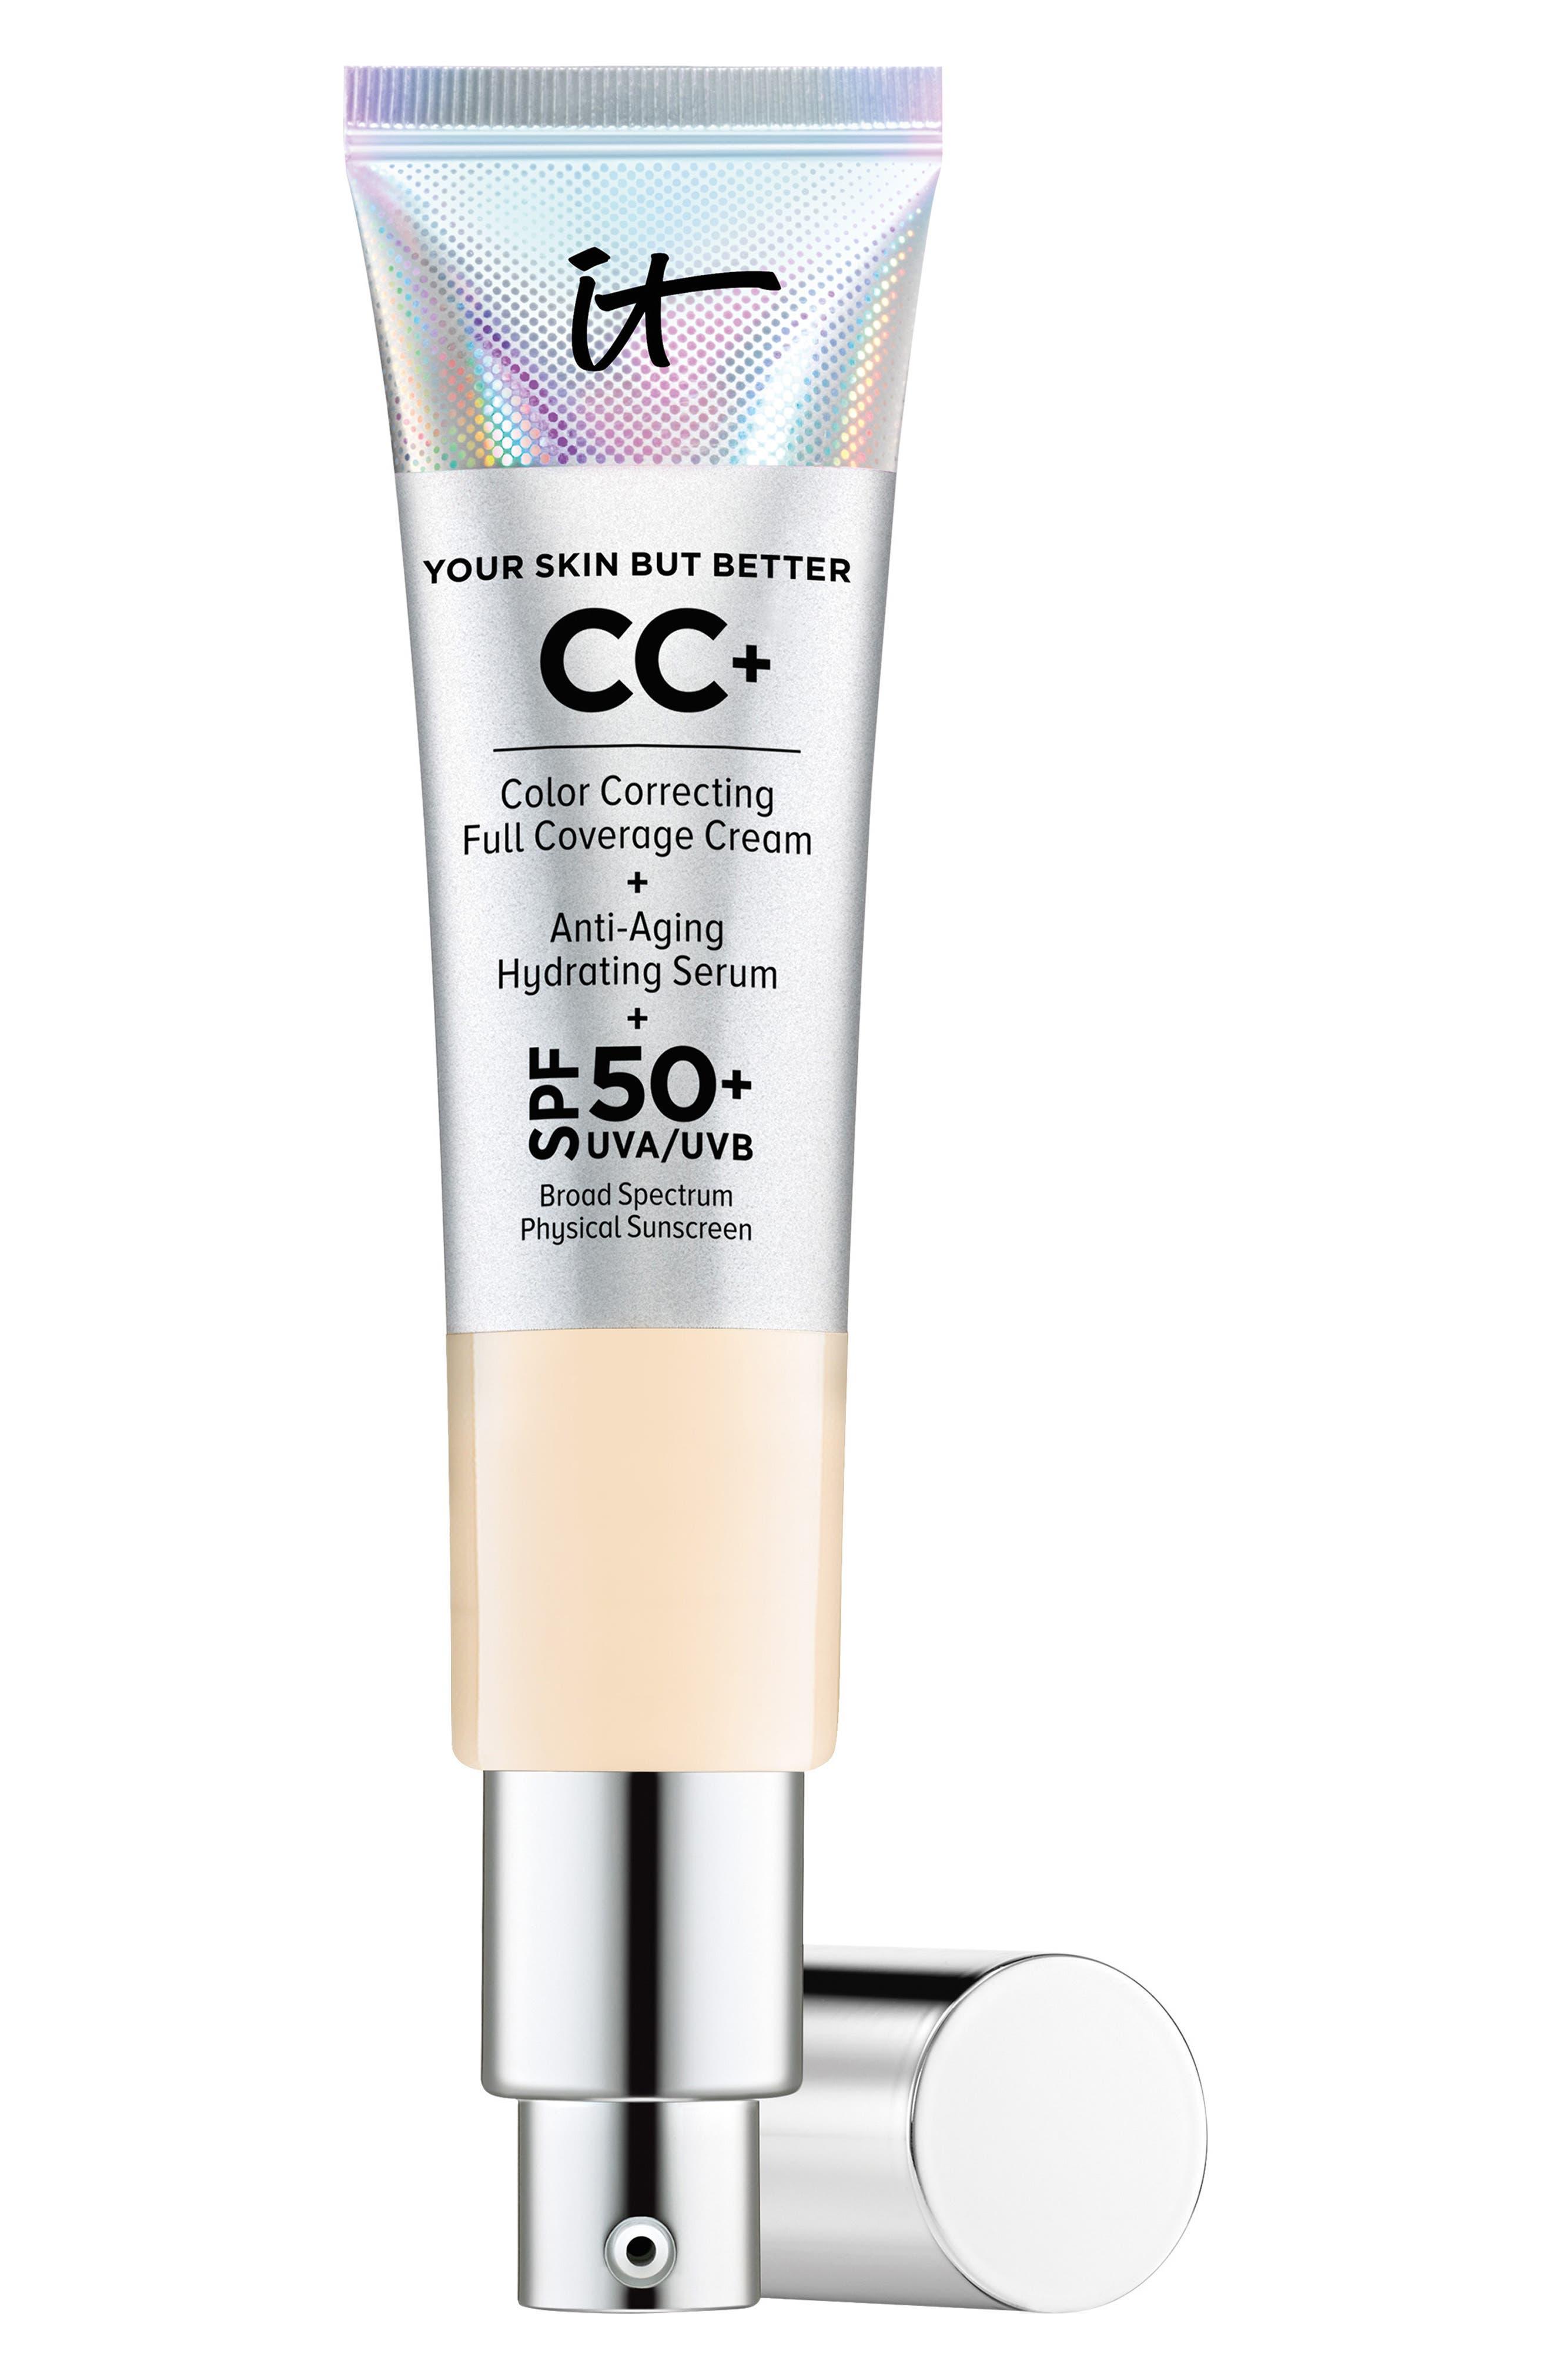 Cc+ Color Correcting Full Coverage Cream Spf 50+